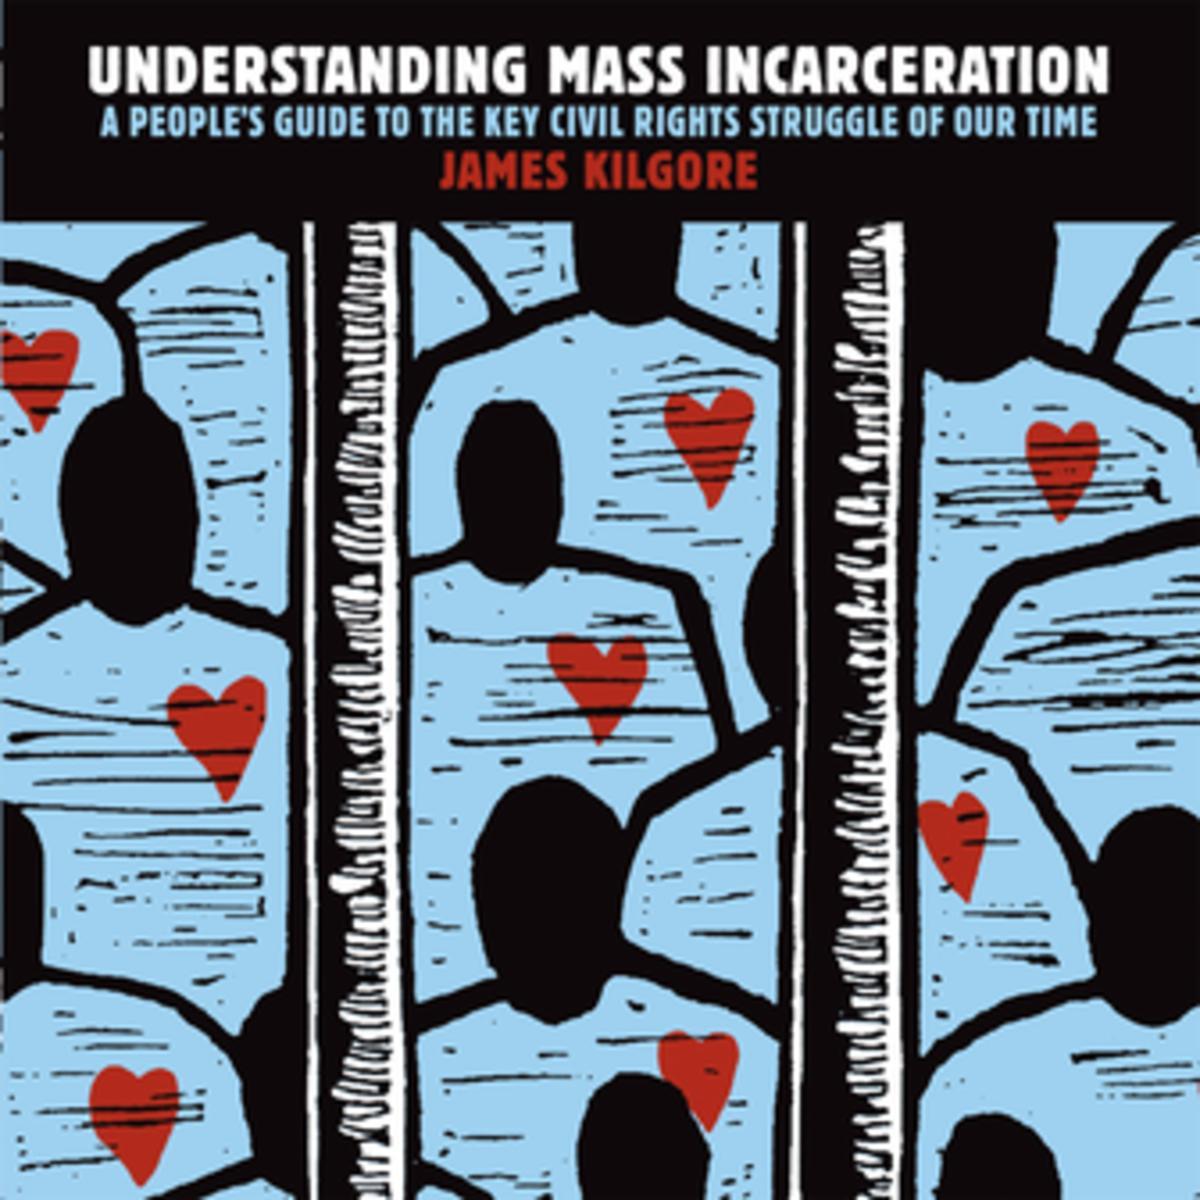 Understanding Mass Incarceration_James Kilgore